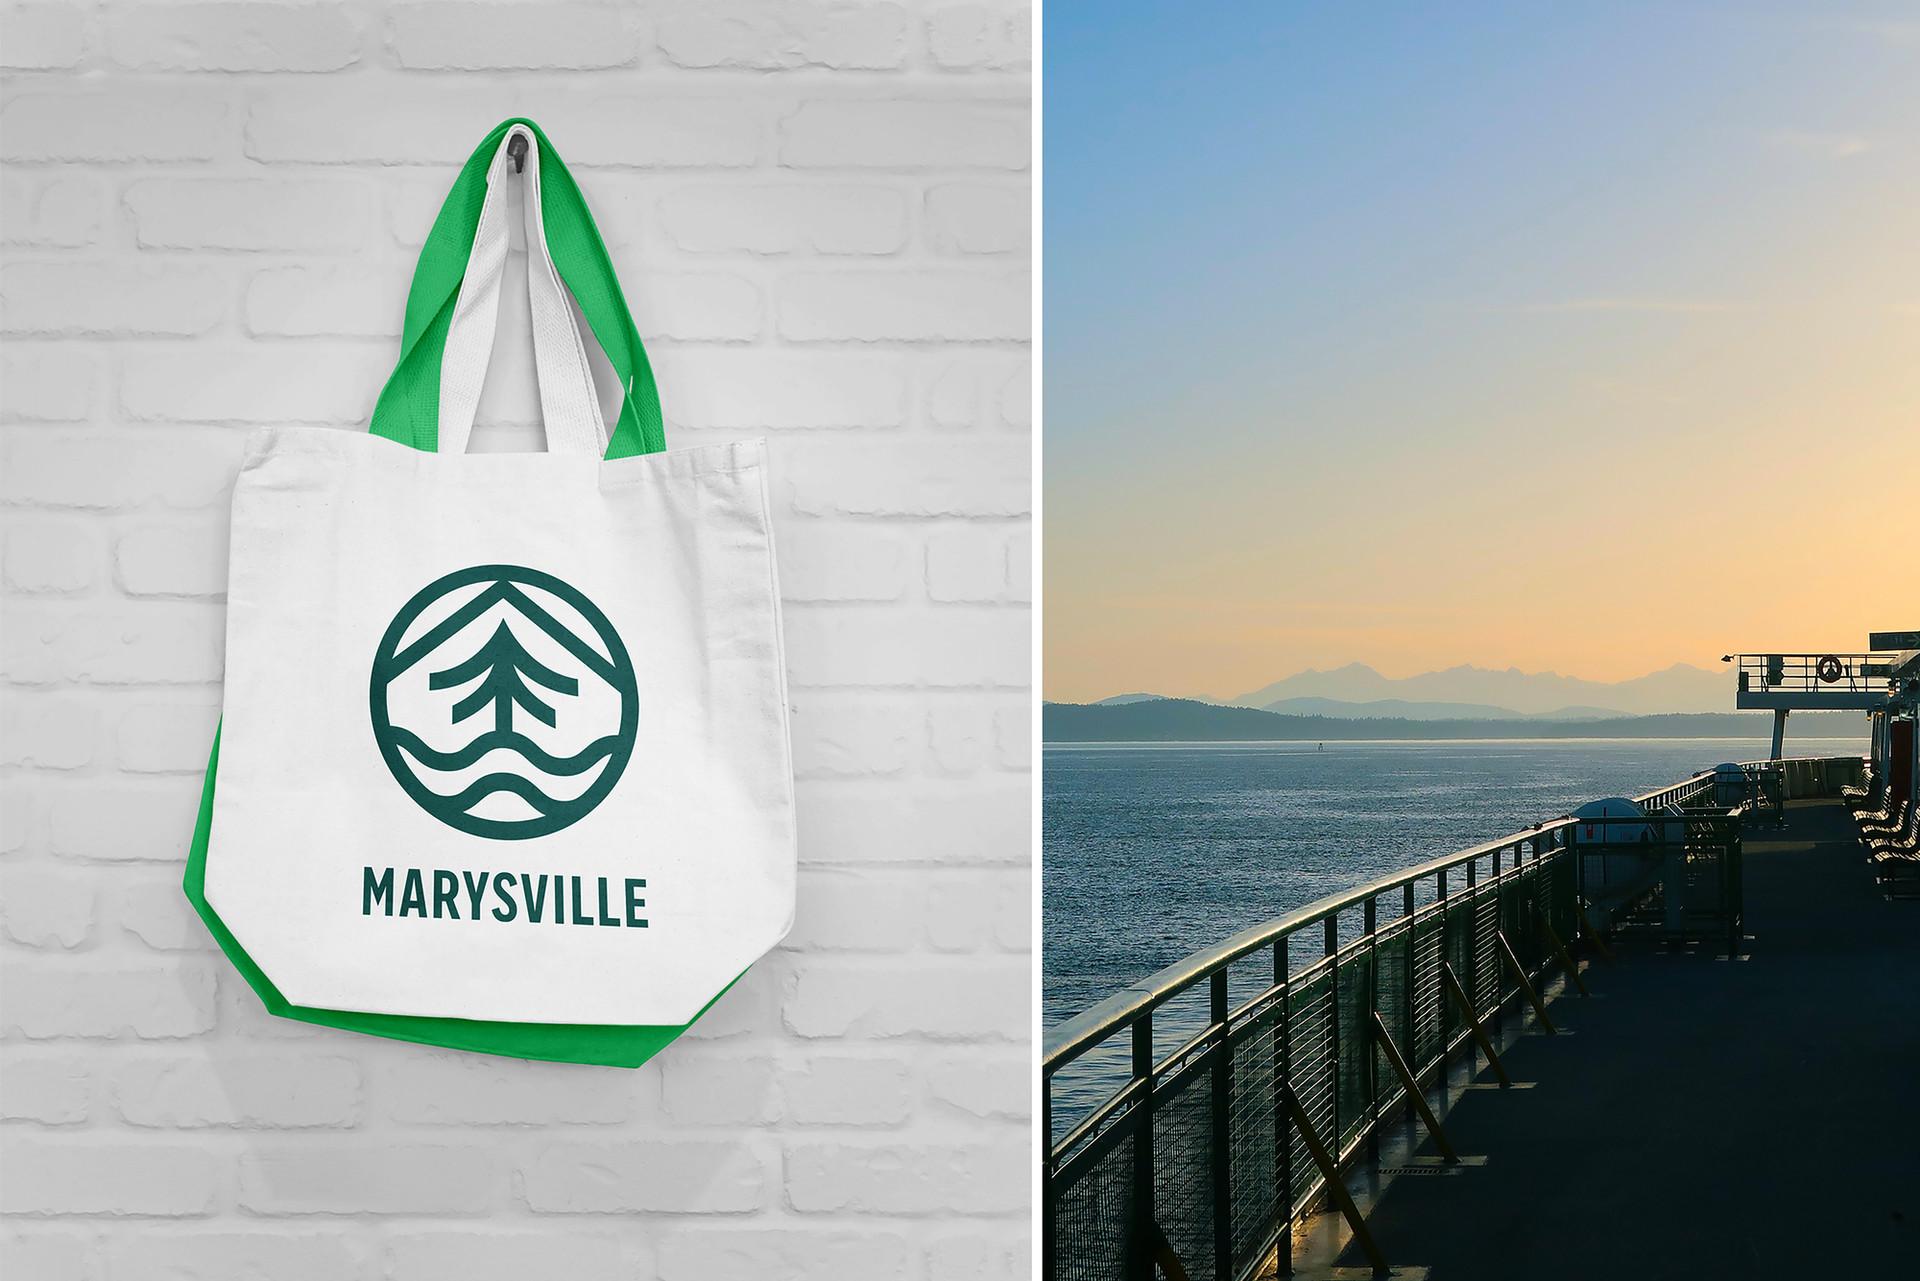 Marysville_4.jpg